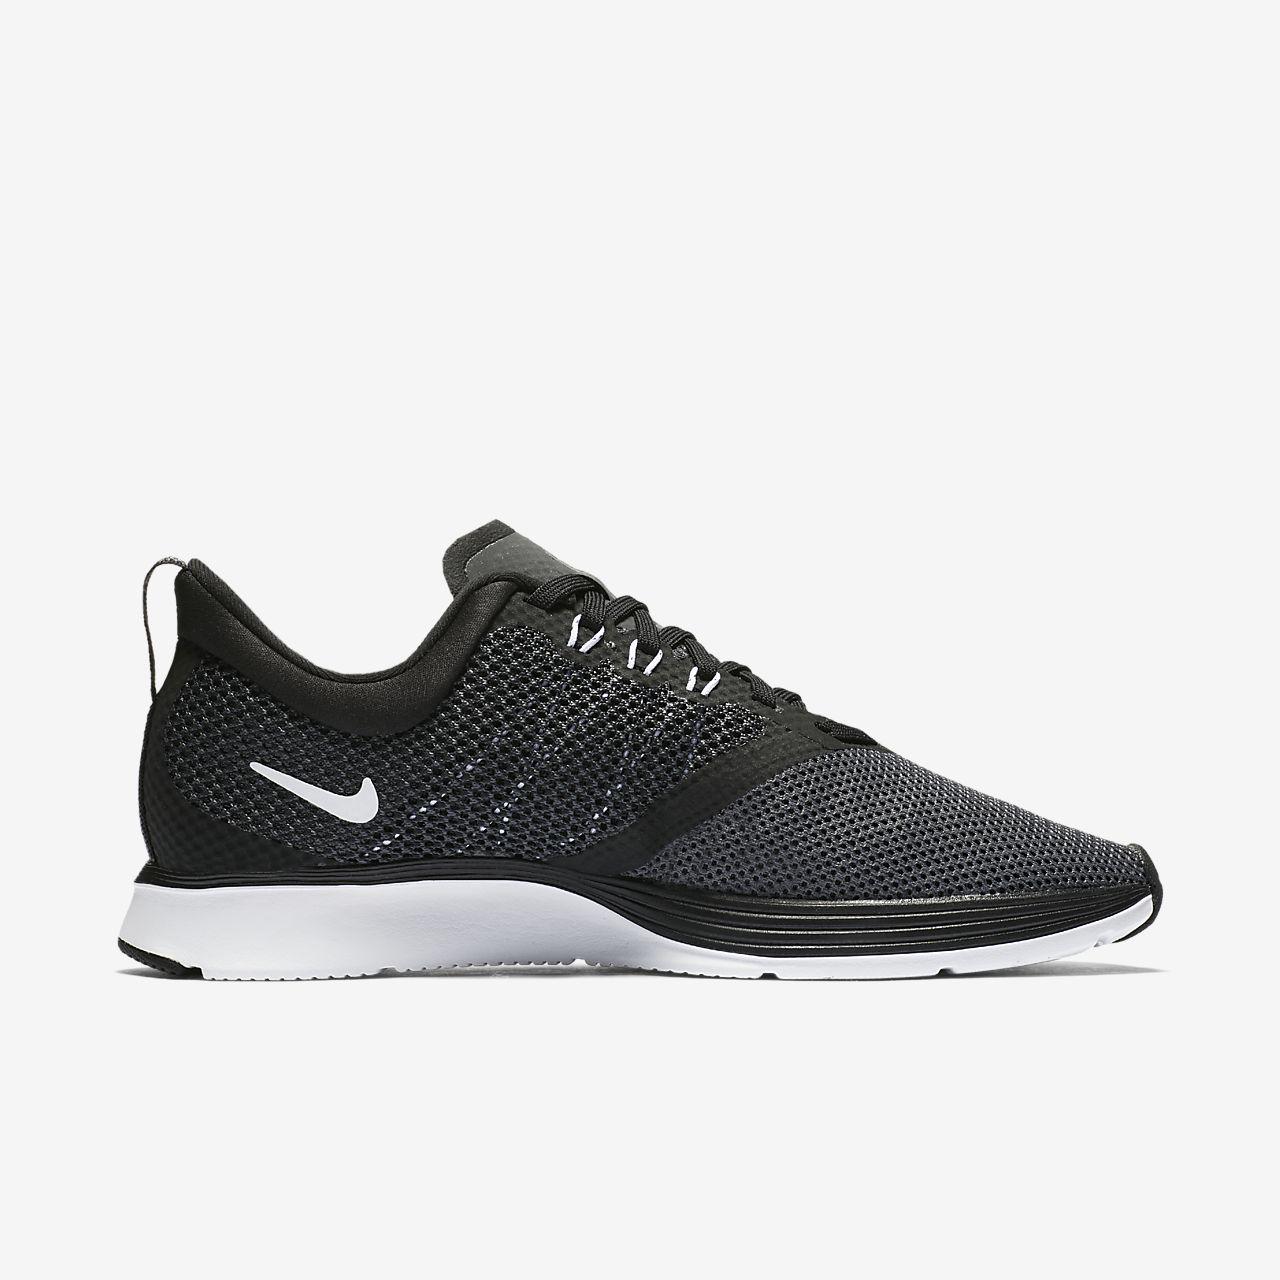 e2ebdb1ff64d67 Nike Zoom Strike Women s Running Shoe. Nike.com AU